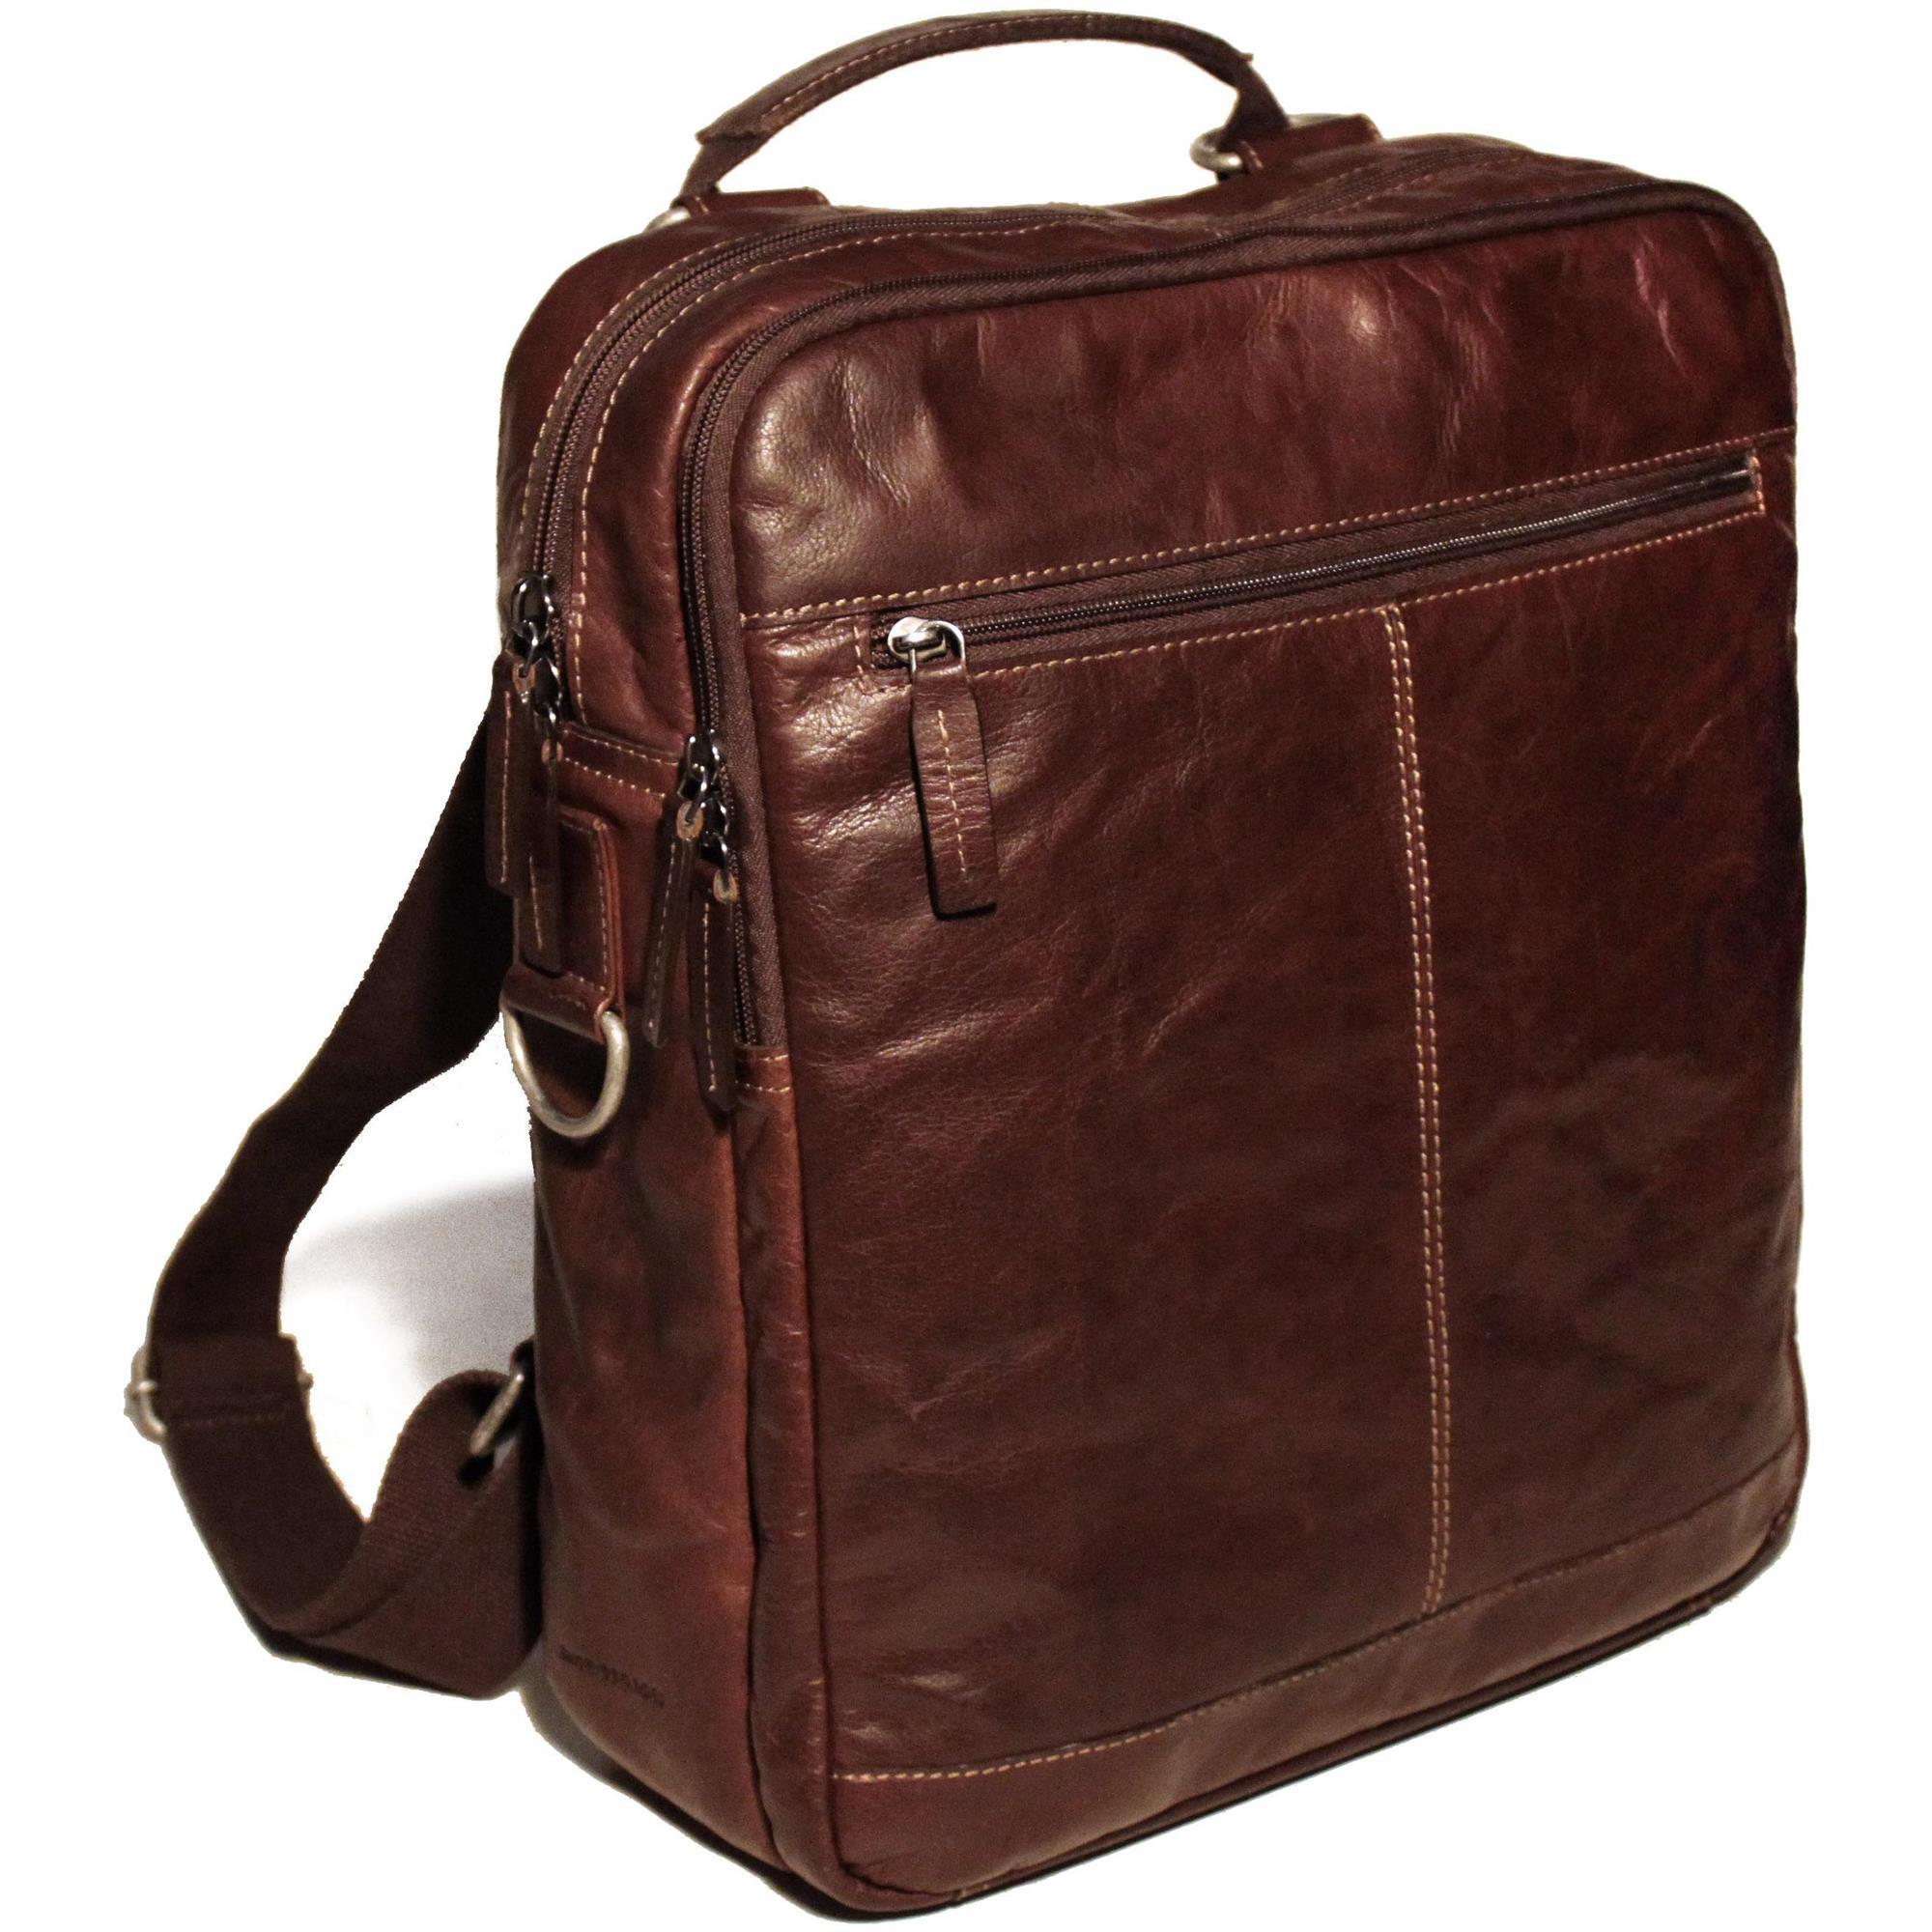 Jack Georges Voyager Leather Convertible Messenger Bag